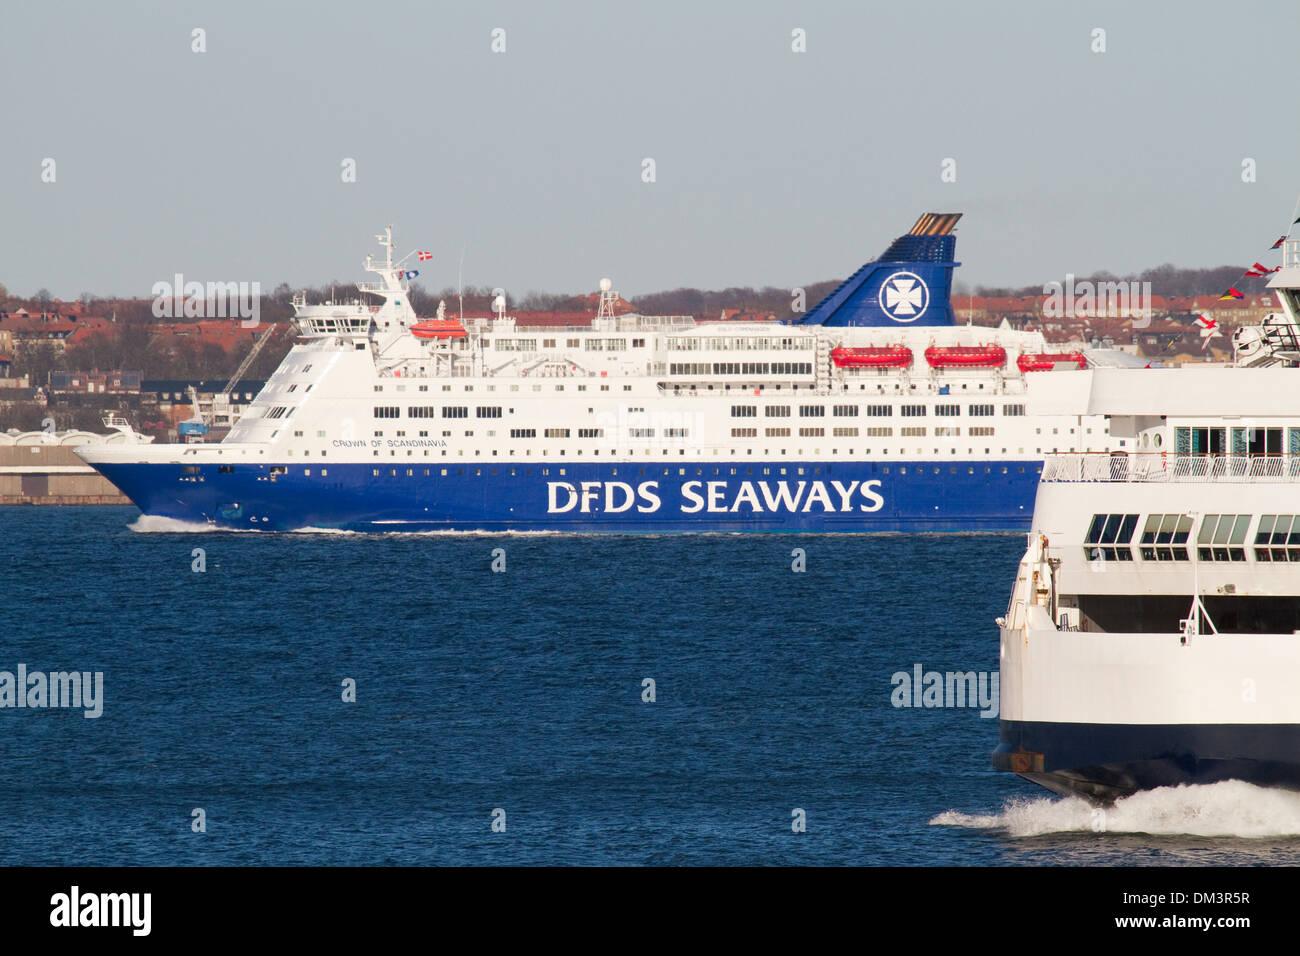 Ferry traffic at Øresund. - Stock Image